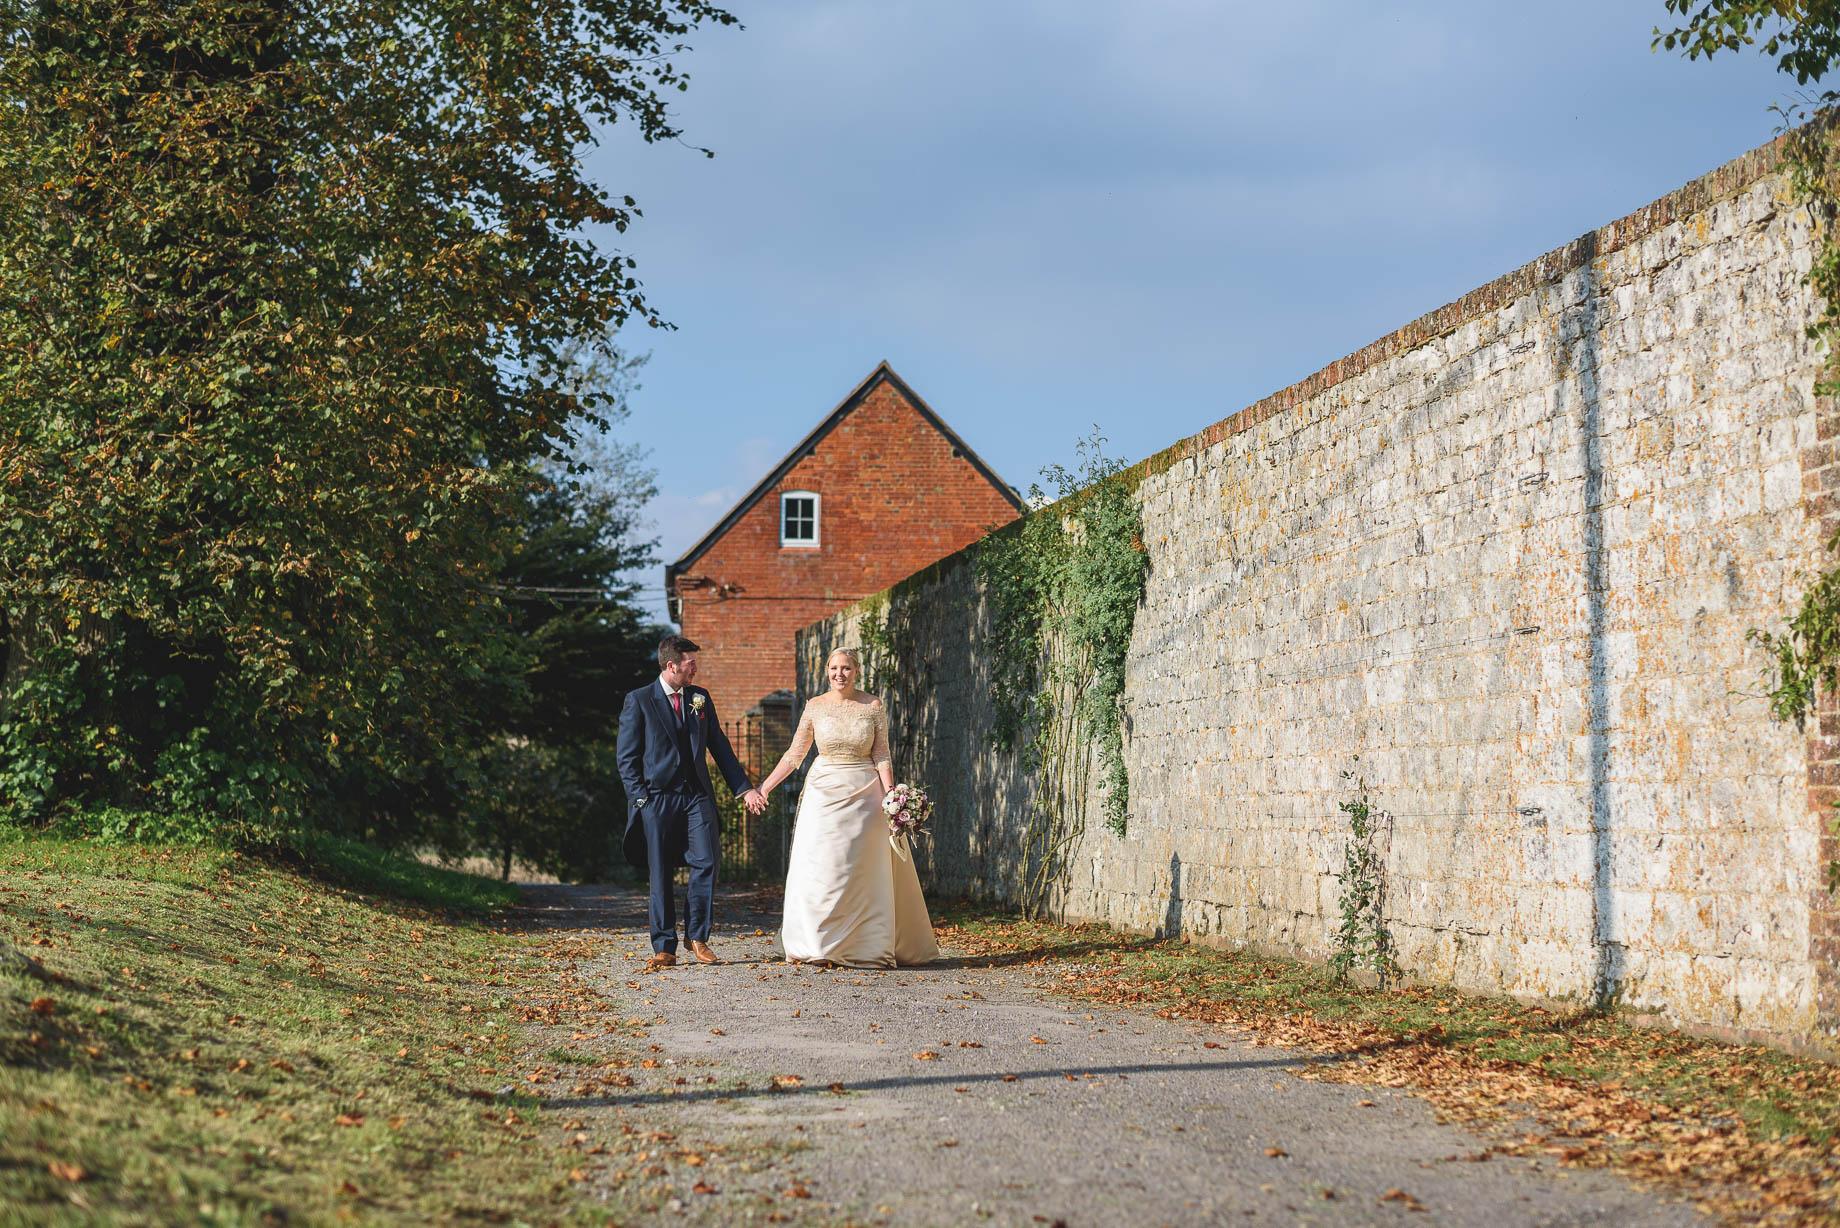 Bury Court Barn wedding photography - Guy Collier - Hannah and Mark (111 of 191)